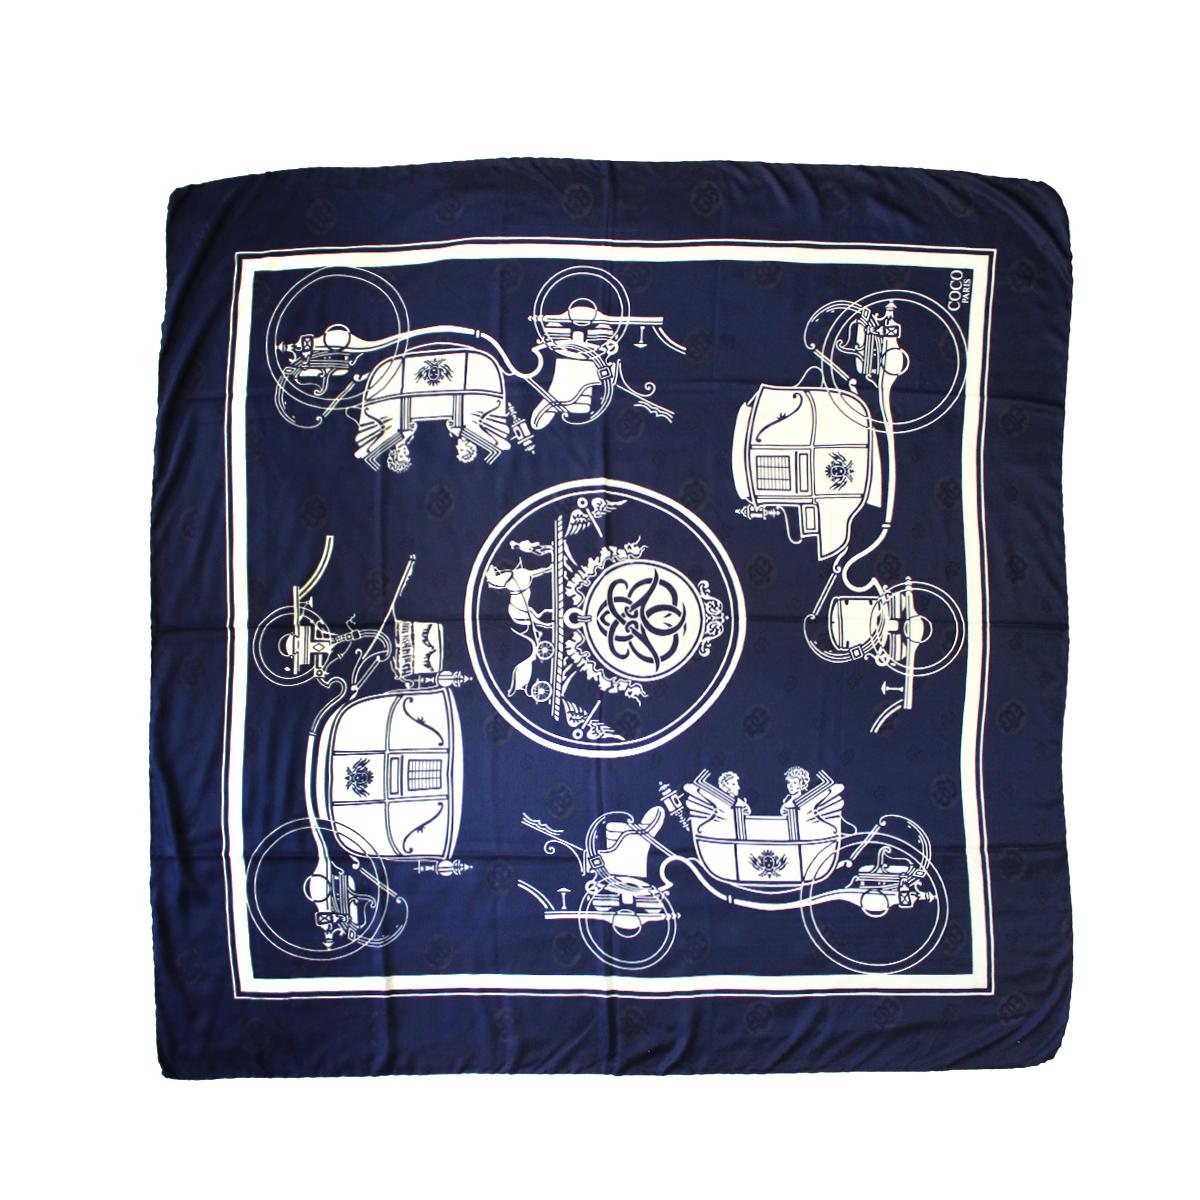 روسری زنانه کوکو طرح درشکه کد 3952 -  - 6